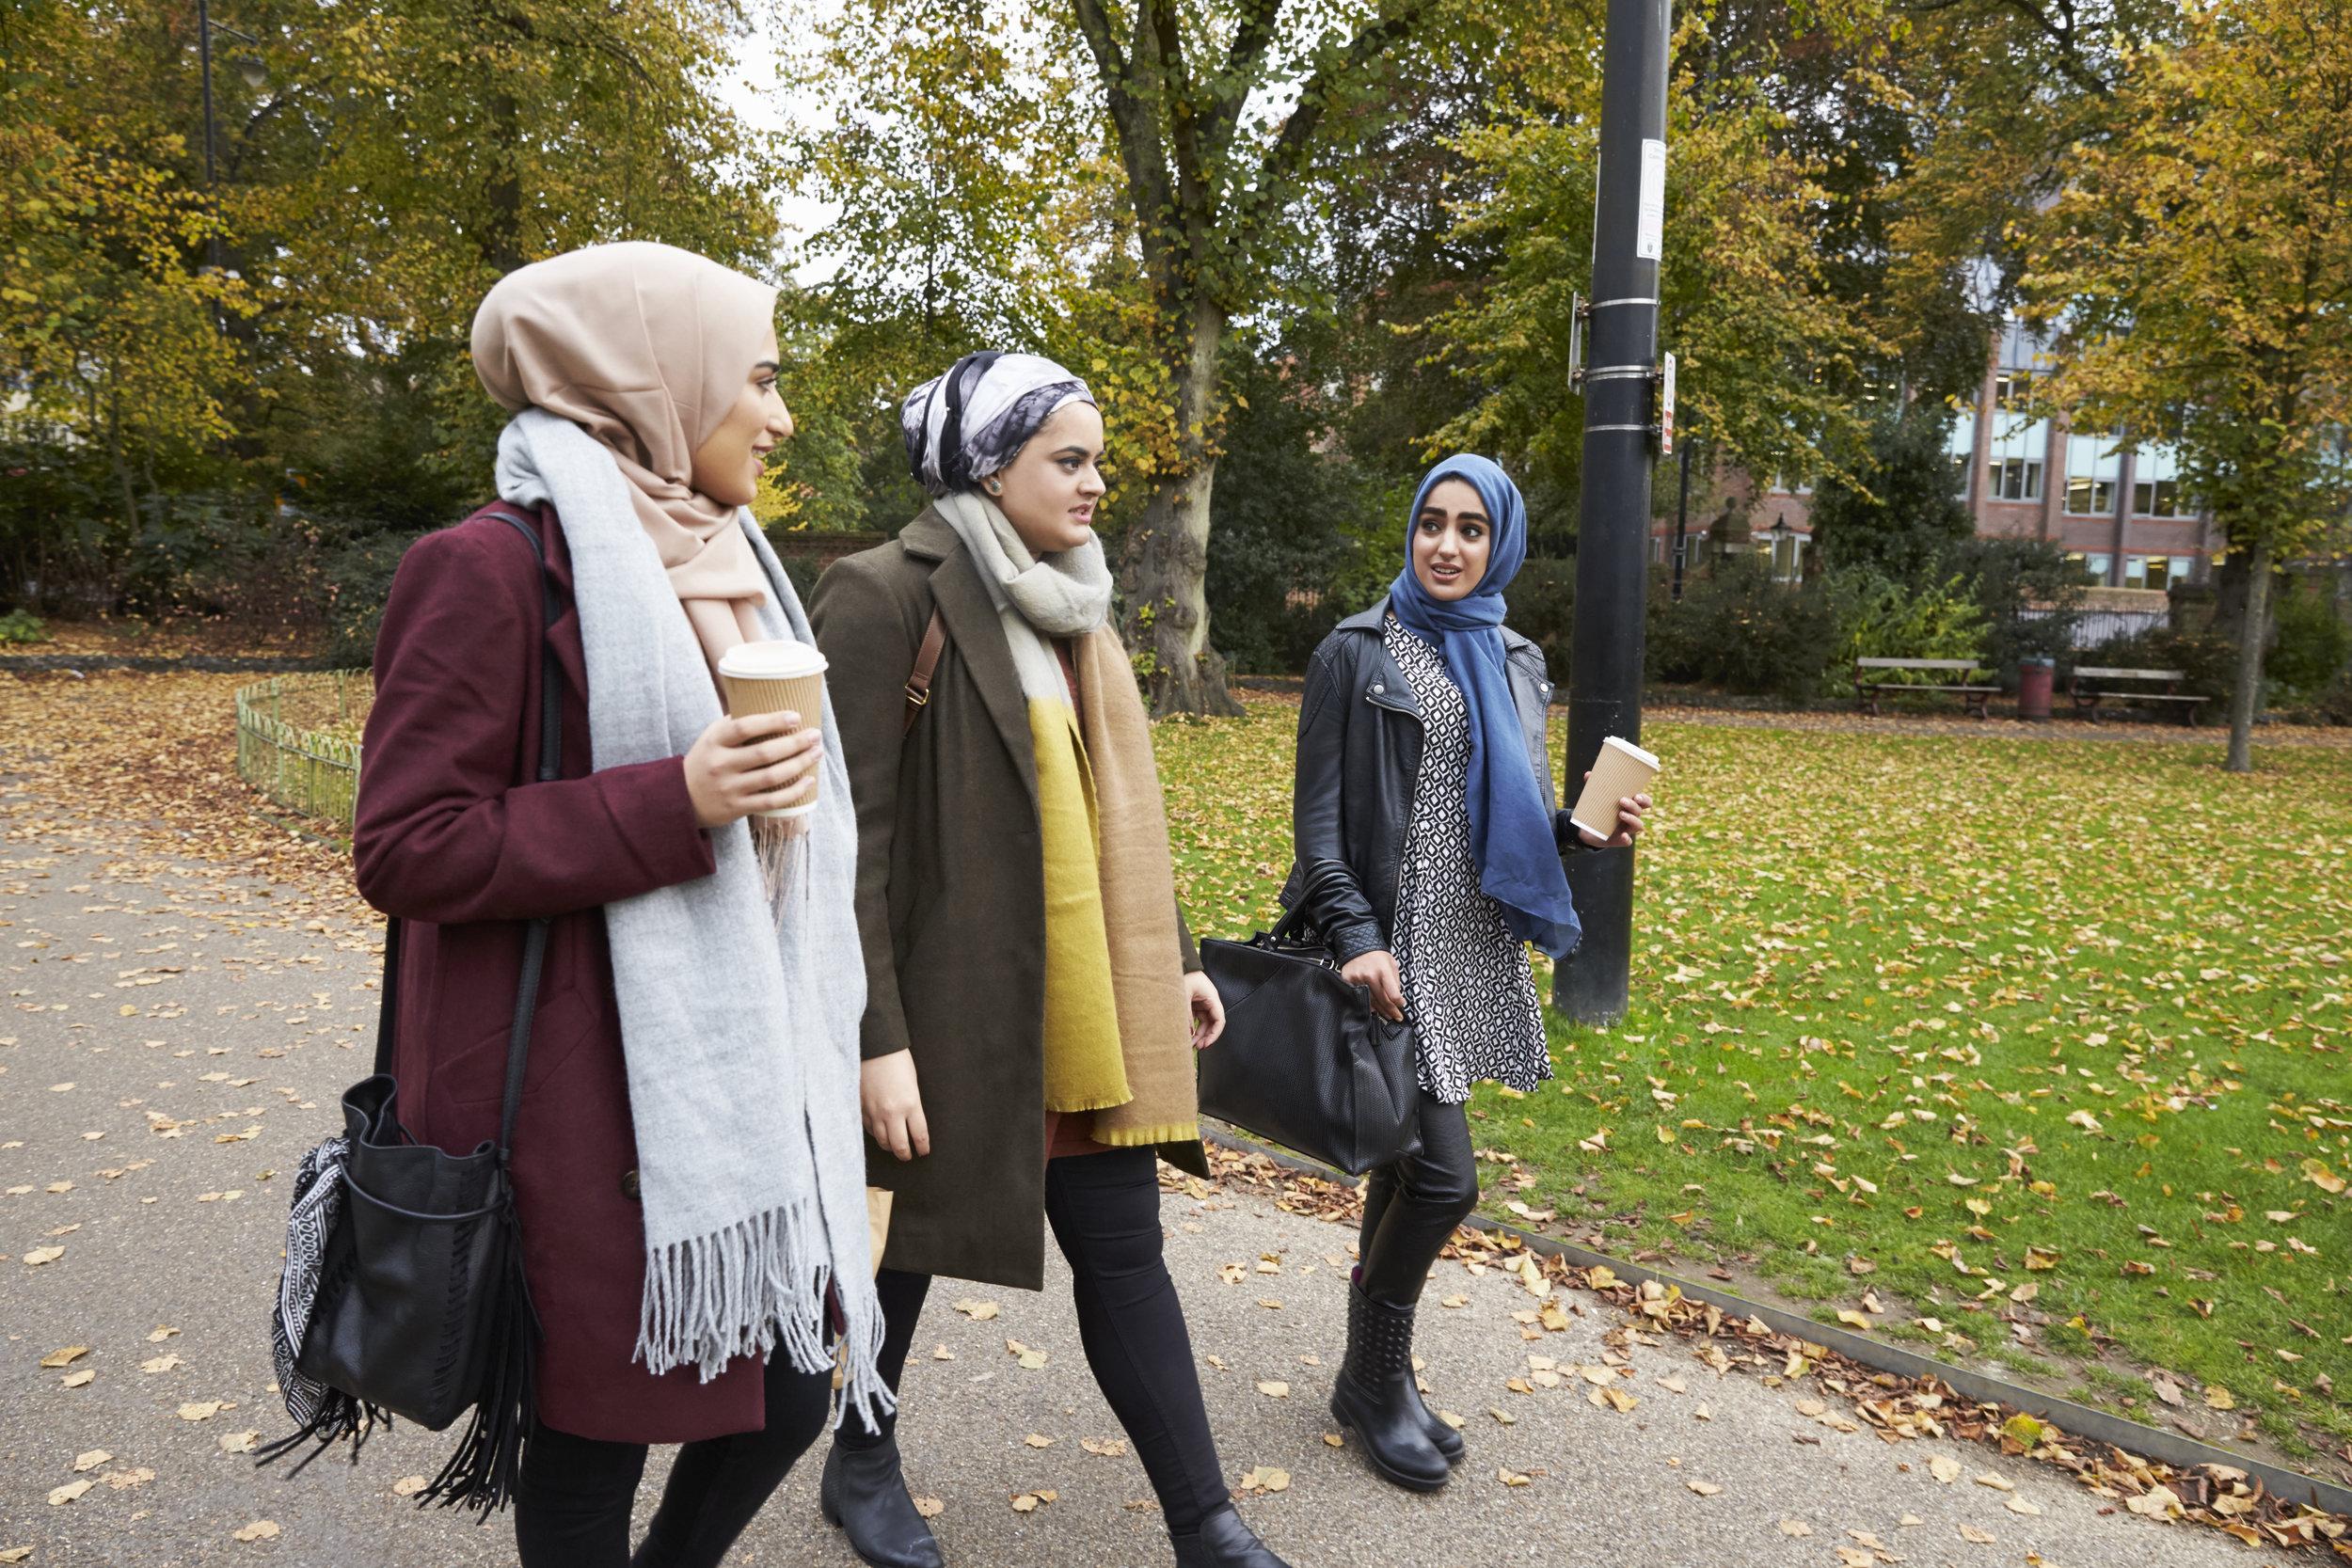 Muslim_Girls_Walking.jpg